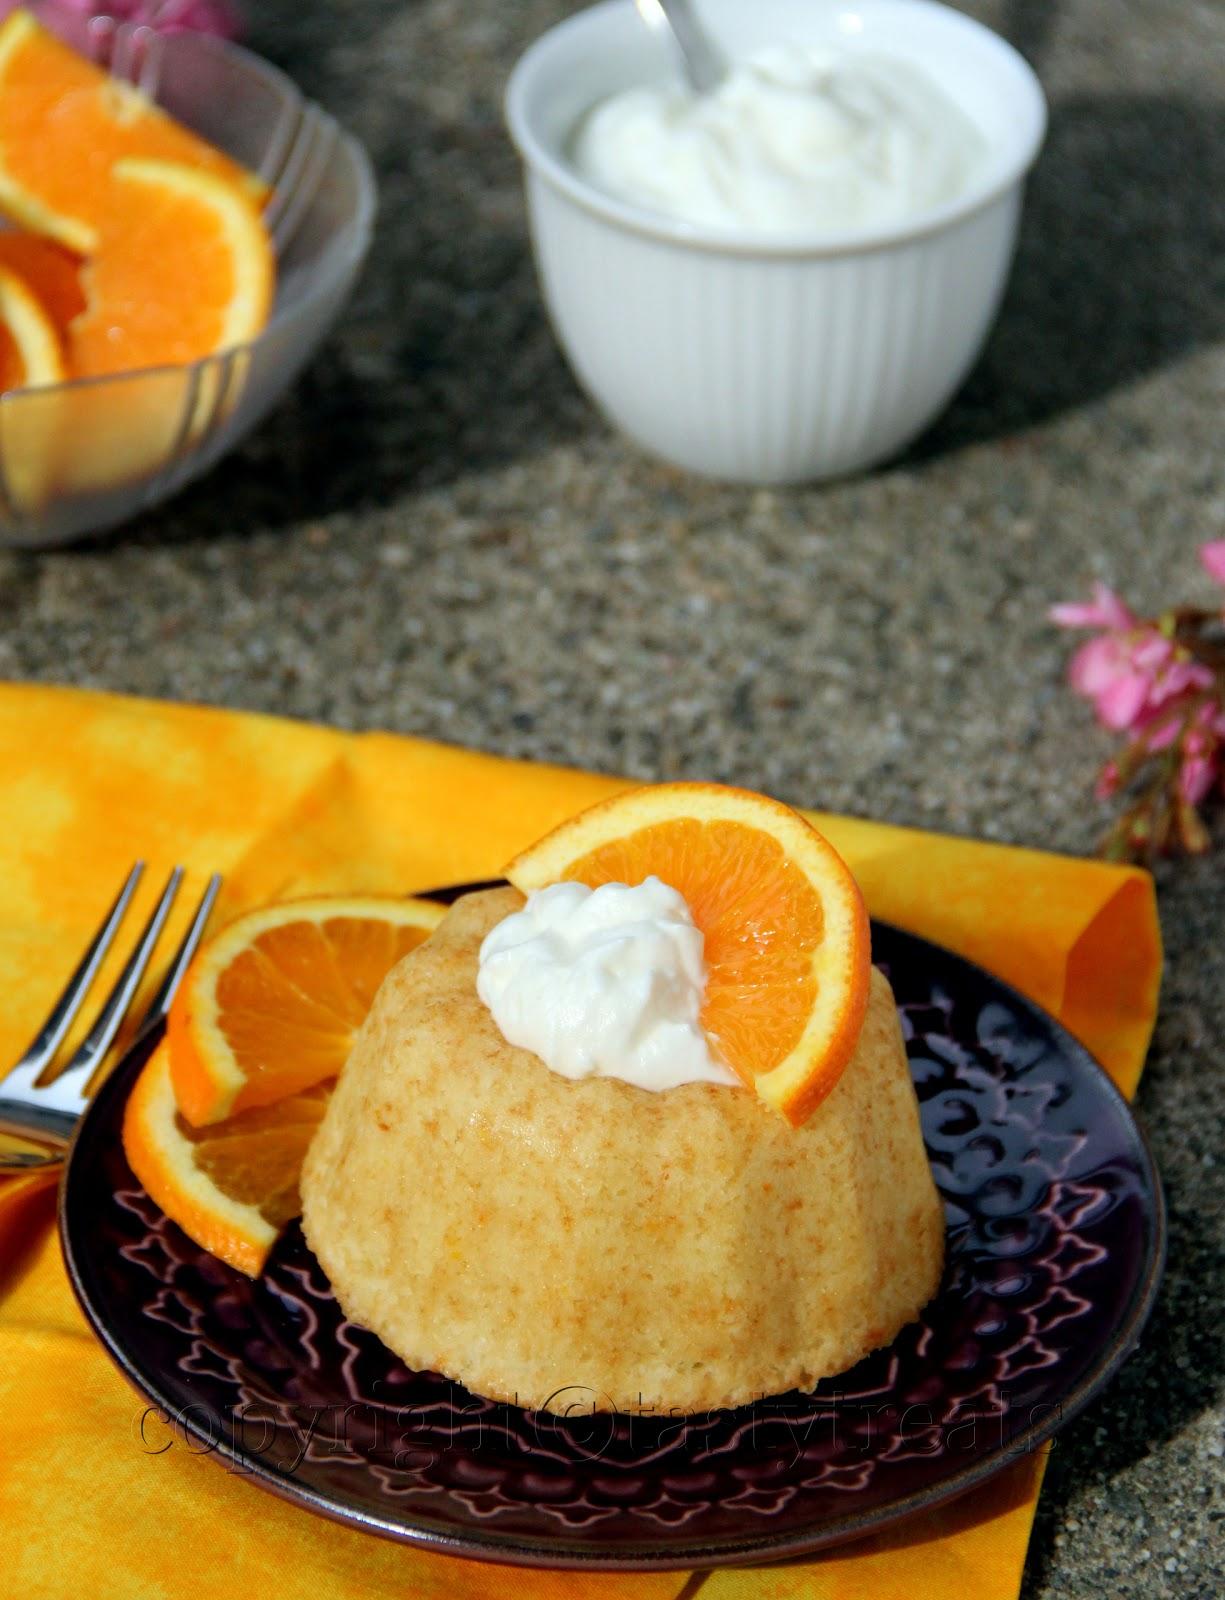 Tasty Treats: Orange Whipped Cream Cake